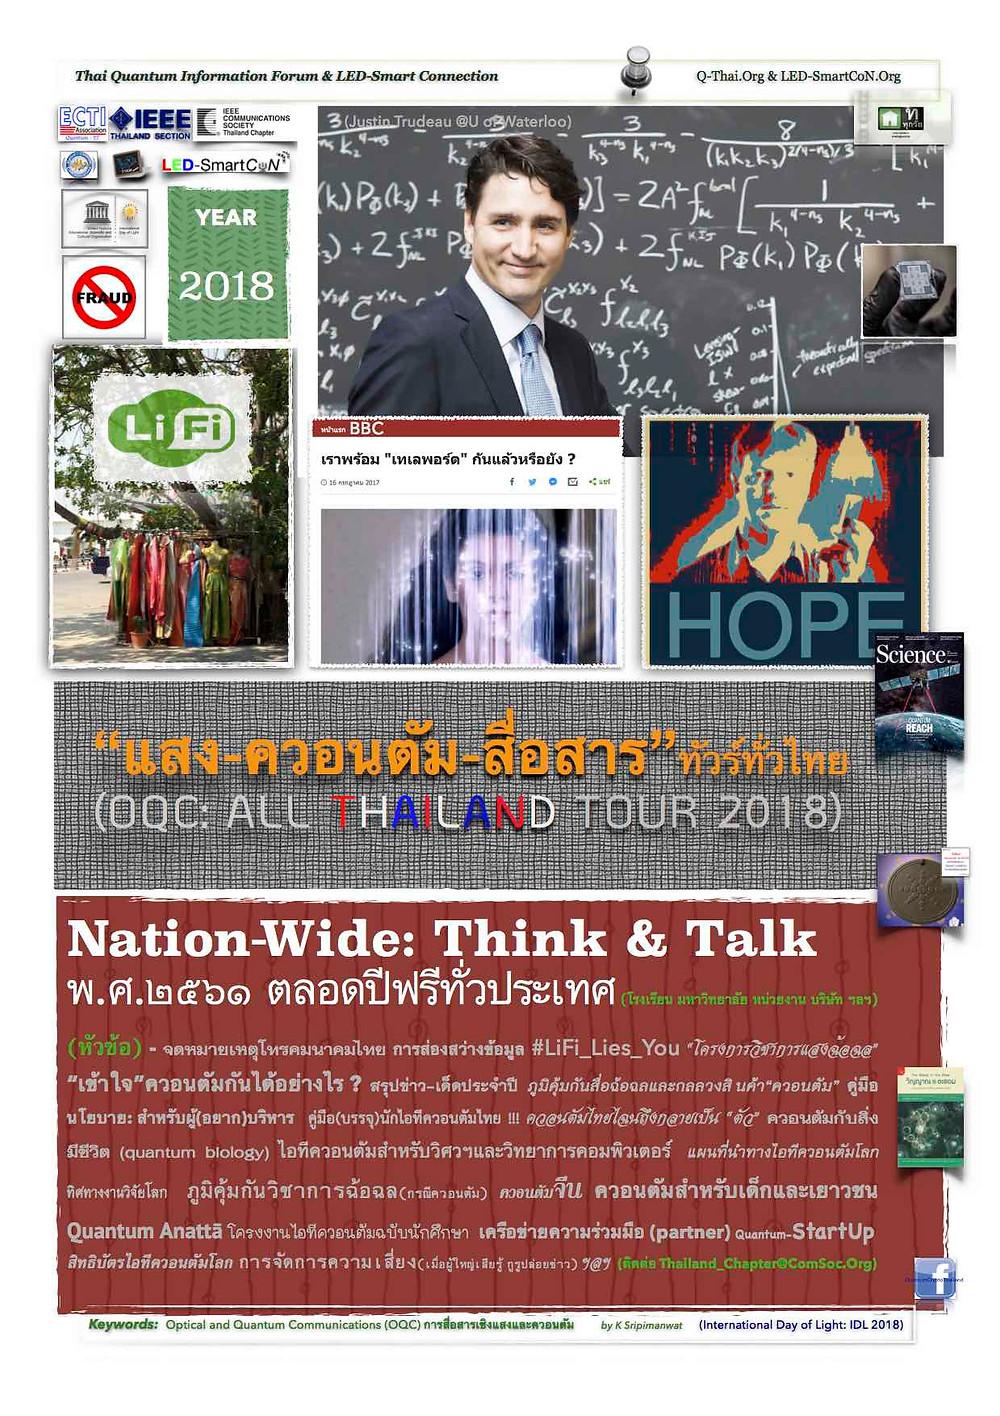 "OQC: All Thailand Tour 2018 ฟรีทั่วไทยกับการทำความเข้าใจ ""แสง-ควอนตัม-สื่อสาร"" กับหัวข้อที่เลือกได้ ... ติดต่อ thailand_chapter@comsoc.org (Free-ฟรี) Nation-Wide: Think & Talk พ.ศ.๒๕๖๑ ตลอดปีฟรีทั่วประเทศ (โรงเรียน มหาวิทยาลัย หน่วยงาน บริษัท ฯลฯ)   (หัวข้อ) - จดหมายเหตุโทรคมนาคมไทย การส่องสว่างข้อมูล #LiFi_Lies_You ""โครงการวิชาการแสงฉ้อฉล"" ""เข้าใจ""ควอนตัมกันได้อย่างไร ? สรุปข่าว-เด็ดประจำปี ภูมิคุ้มกันสื่อฉ้อฉลและกลลวงสินค้า""ควอนตัม"" คู่มือนโยบาย: สำหรับผู้(อยาก)บริหาร คู่มือ(บรรจุ)นักไอทีควอนตัมไทย !!! ควอนตัมไทยไฉนถึงกลายเป็น ""ตัว"" ควอนตัมกับสิ่งมีชีวิต (quantum biology) ไอทีควอนตัมสำหรับวิศวฯและวิทยาการคอมพิวเตอร์ แผนที่นำทางไอทีควอนตัมโลก ทิศทางงานวิจัยโลก ภูมิคุ้มกันวิชาการฉ้อฉล(กรณีควอนตัม) ควอนตัมจีน ควอนตัมสำหรับเด็กและเยาวชน Quantum Anattā โครงงานไอทีควอนตัมฉบับนักศึกษา เครือข่ายความร่วมมือ (partner) Quantum-StartUp  สิทธิบัตรไอทีควอนตัมโลก การจัดการความเสี่ยง(เมื่อผู้ใหญ่เสียรู้ กูรูปล่อยข่าว) ฯลฯ (ติดต่อ Thailand_Chapter@ComSoc.Org) . โครงการวิทยาทาน โดยสมาคมวิชาการ ECTI สาขา QuantumIT และ IEEE ComSoc Thailand - IEEE Thailand section รายละเอียดเพิ่มเติมที่ ...  Q-Thai.Org LED-SmartCoN.Org และ ThaitelecomKM.Org"